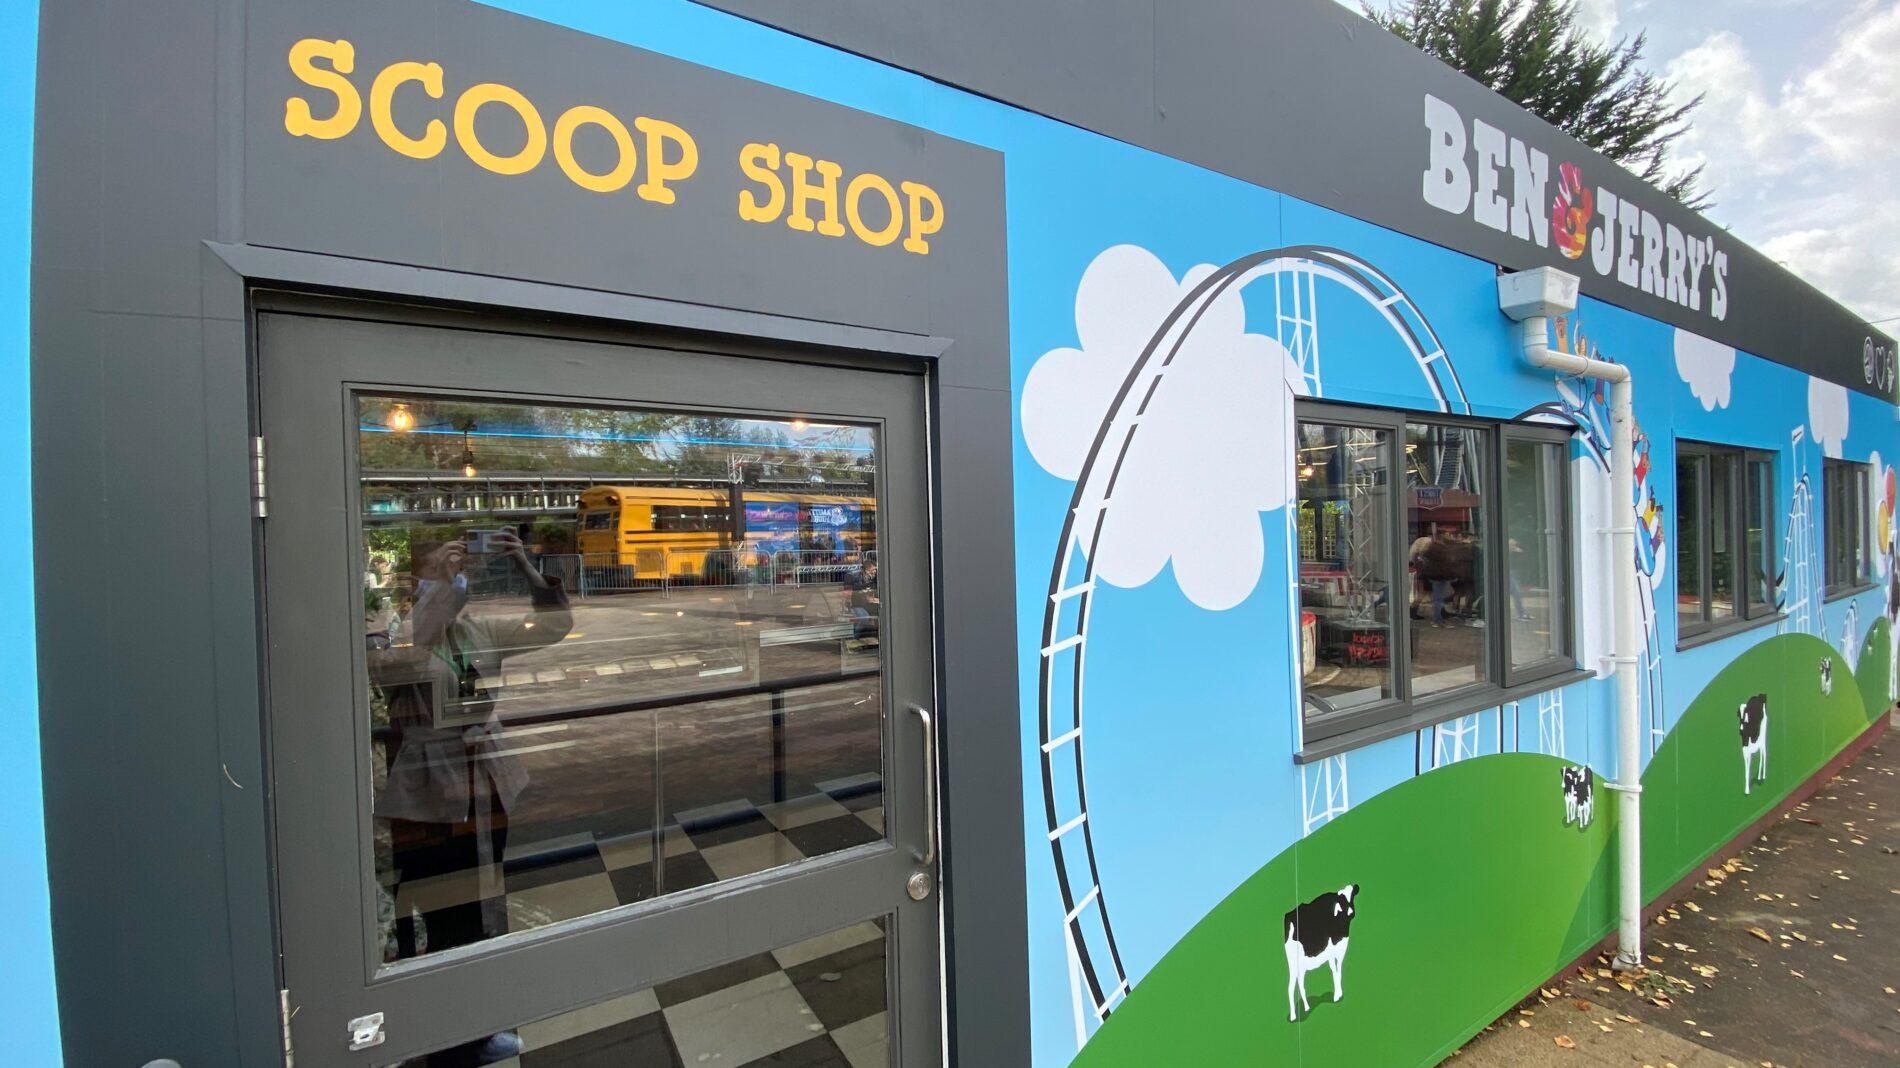 Ben and Jerry's Thorpe Park scoop shop exterior